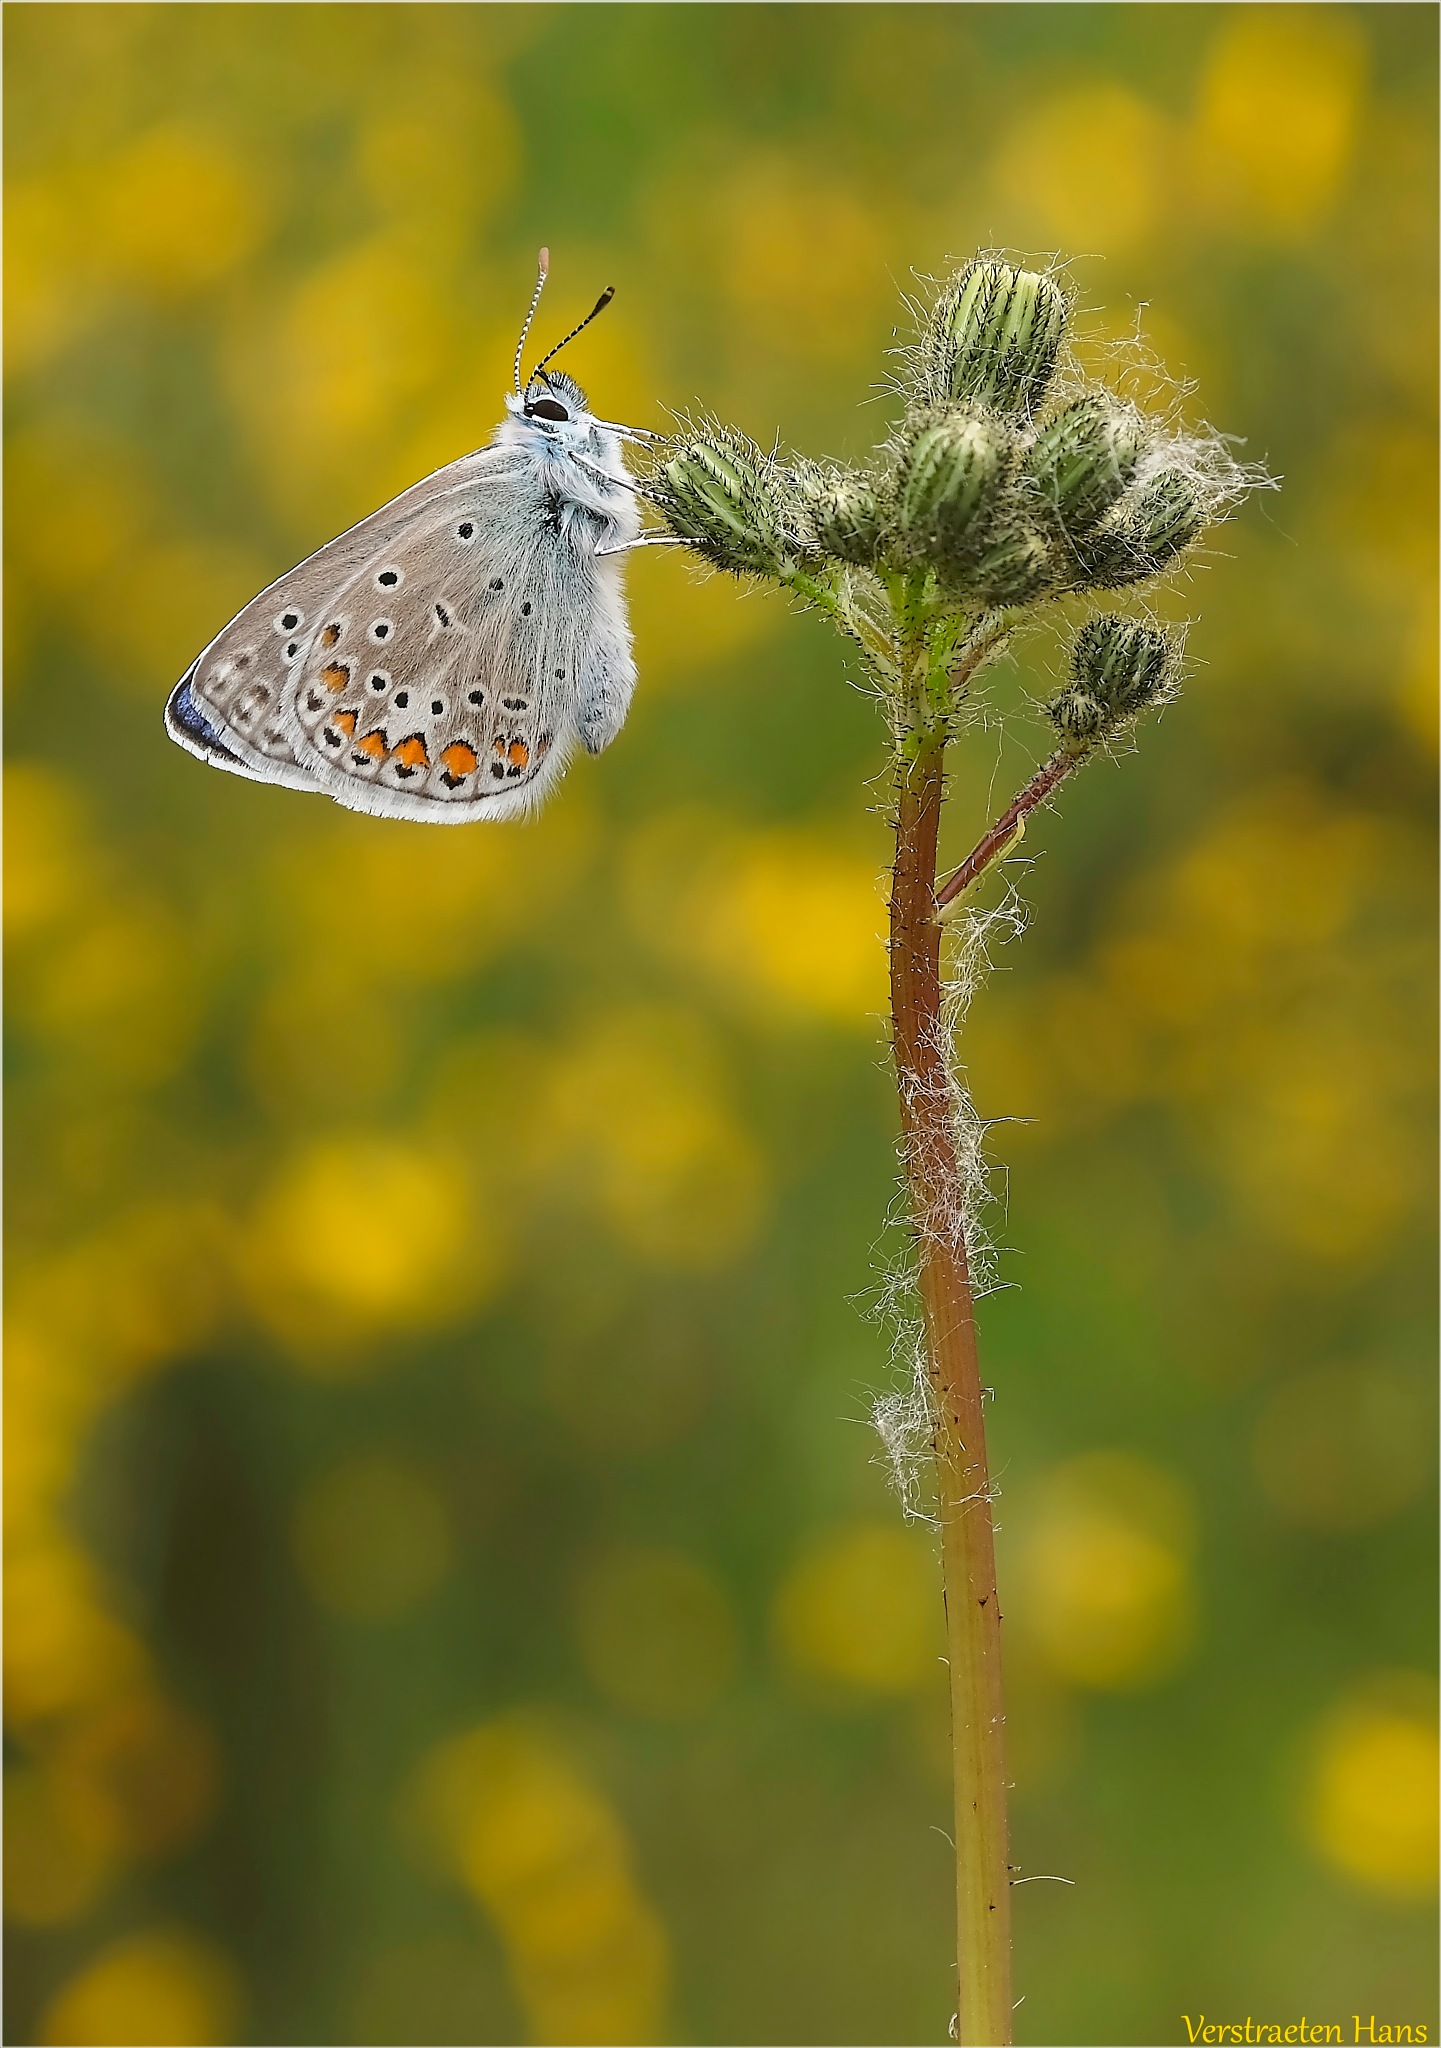 Icarusblauwtje - Polyommatus icarus by zard319